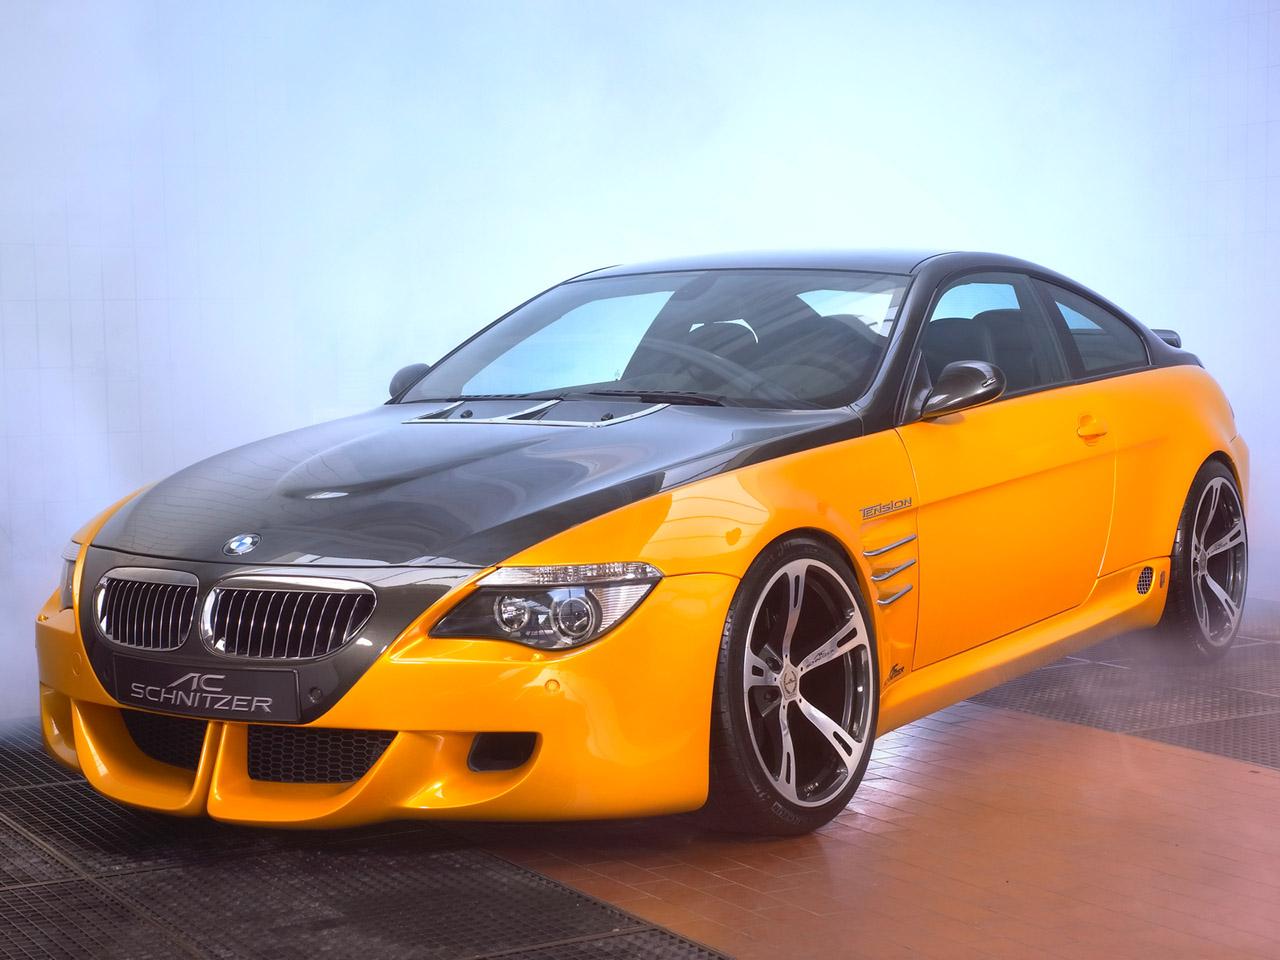 Free Desktop Wallpapers | Backgrounds: BMW Car Wallpapers ...